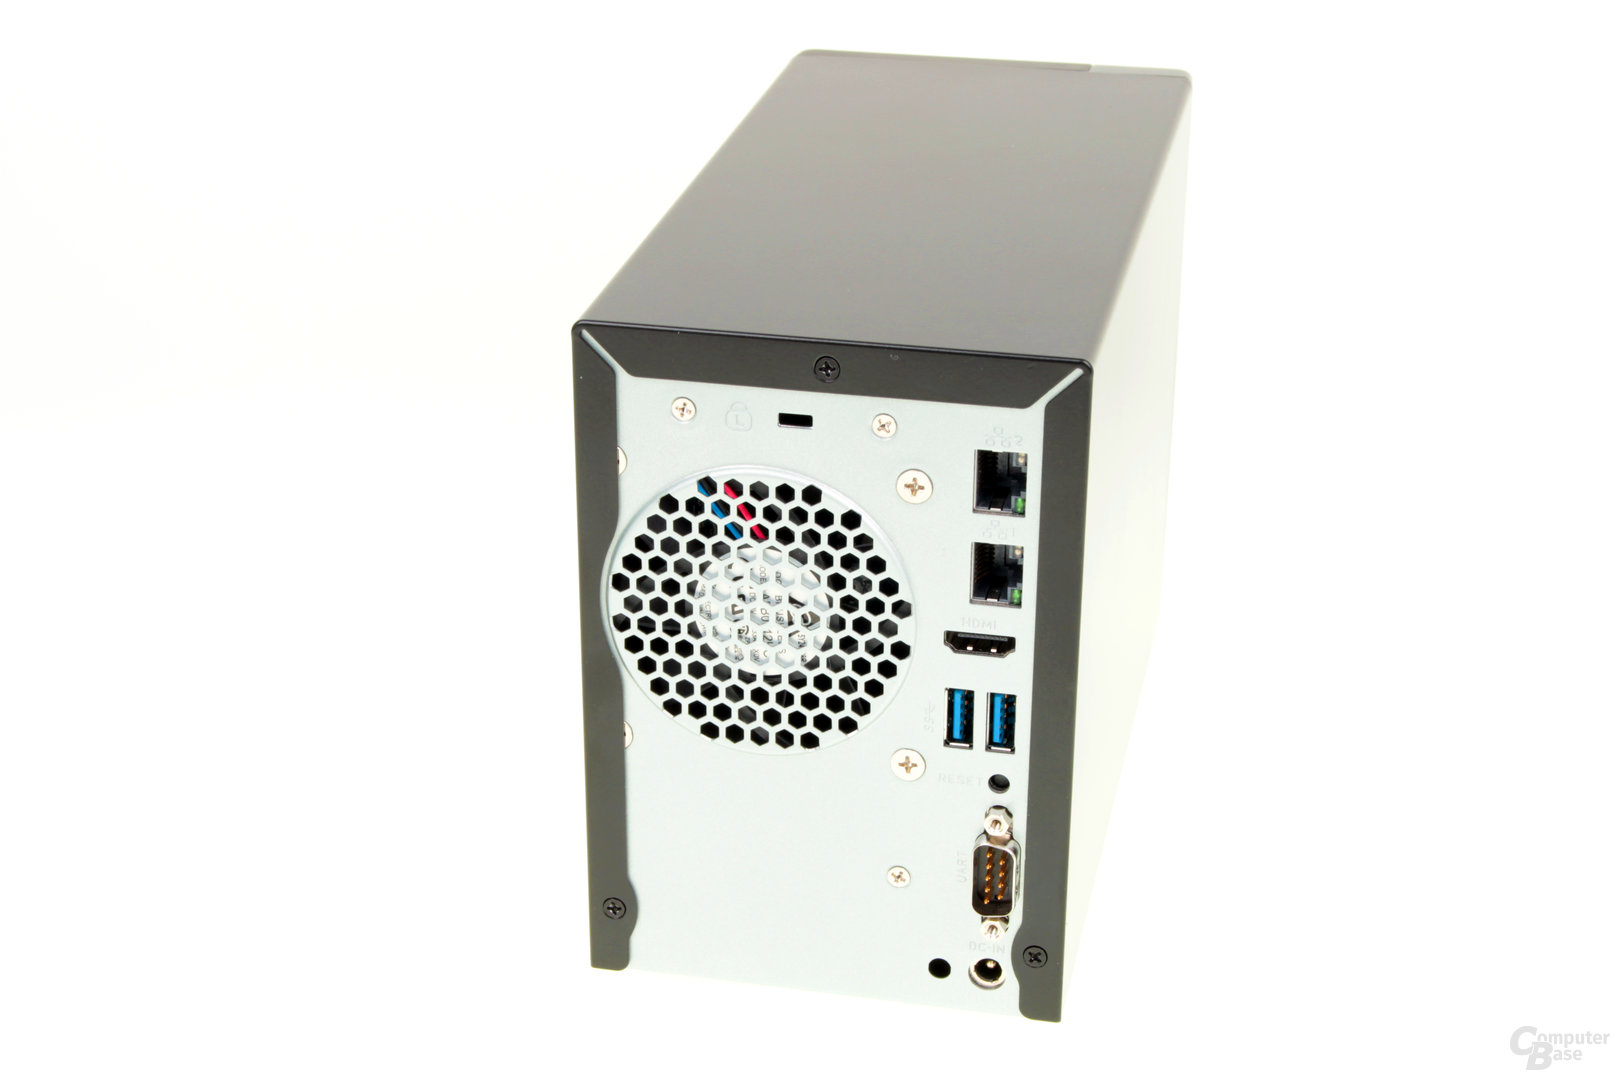 Thecus N2810 – HDMI, USB und Co. and er Rückseite